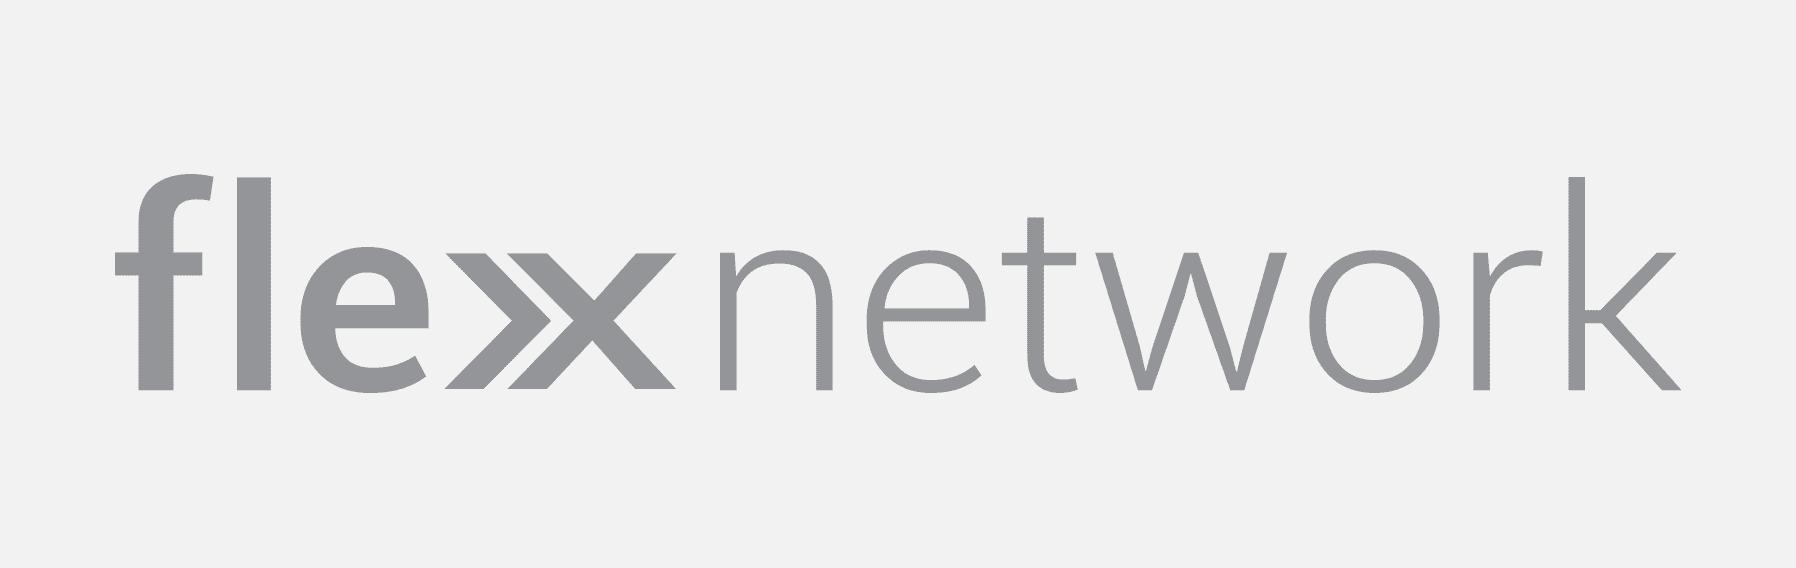 flexnetwork